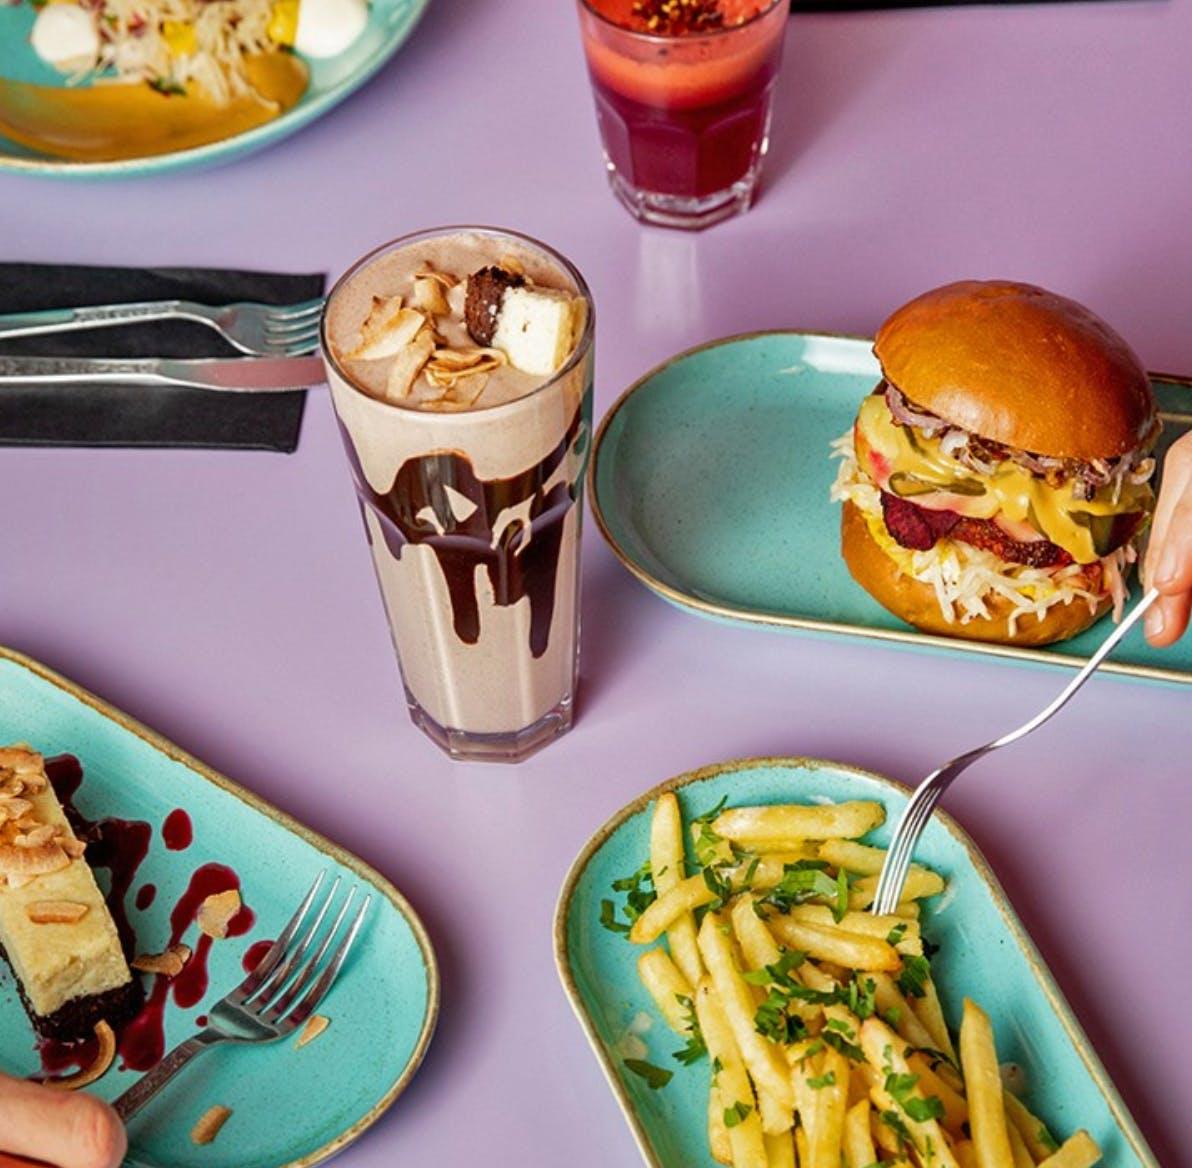 burger and fries and milkshake